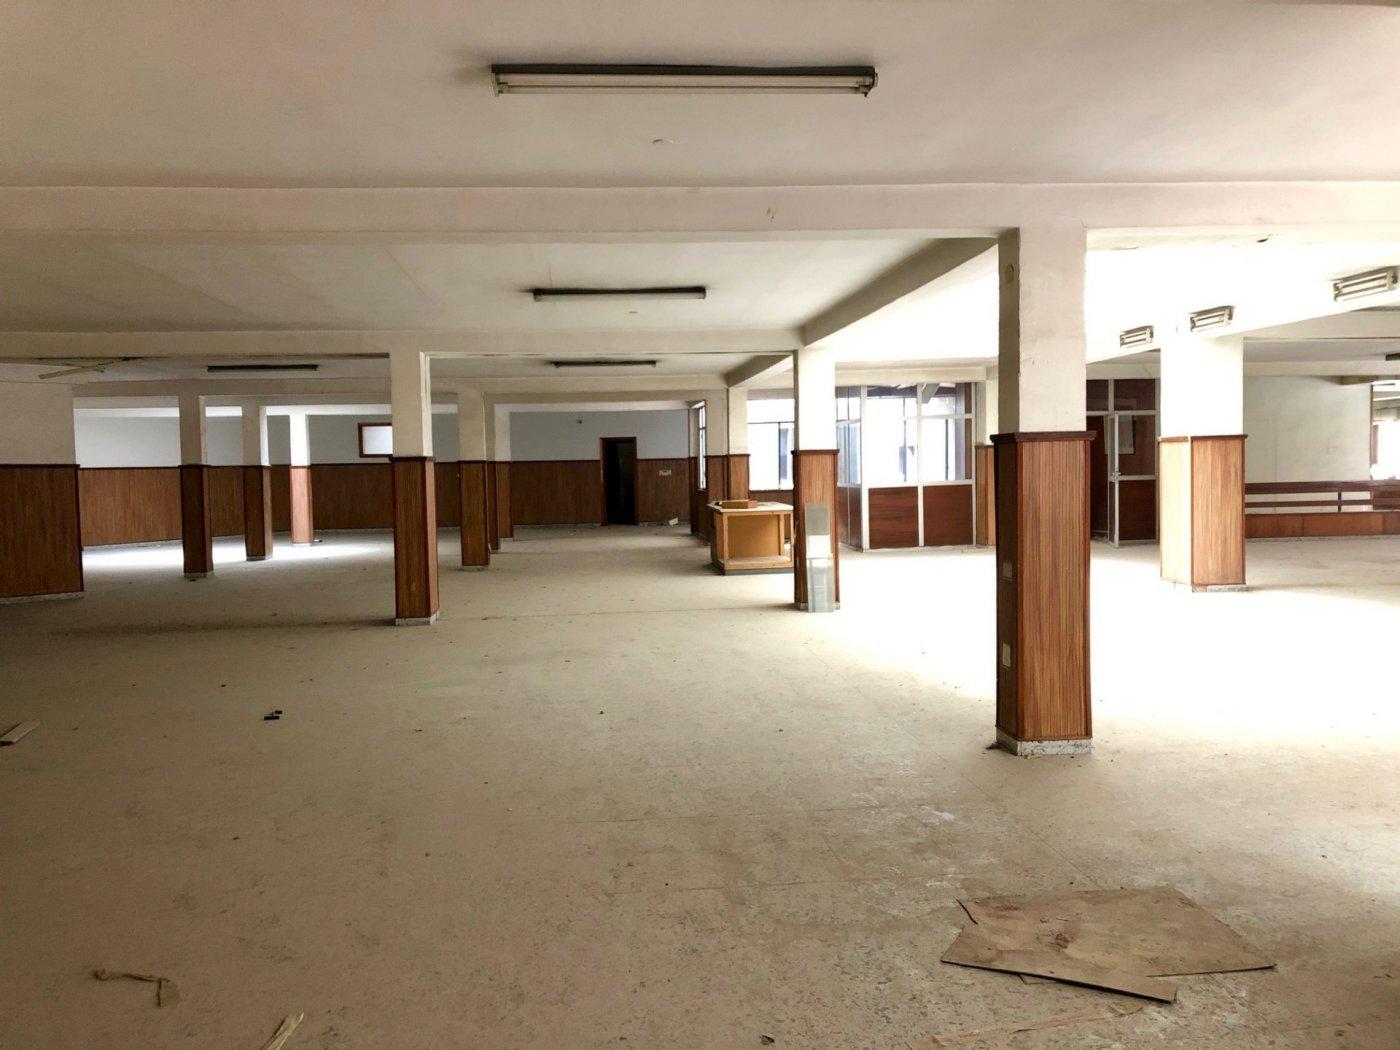 Oficina para reformar en alquiler en Murcia, Centro